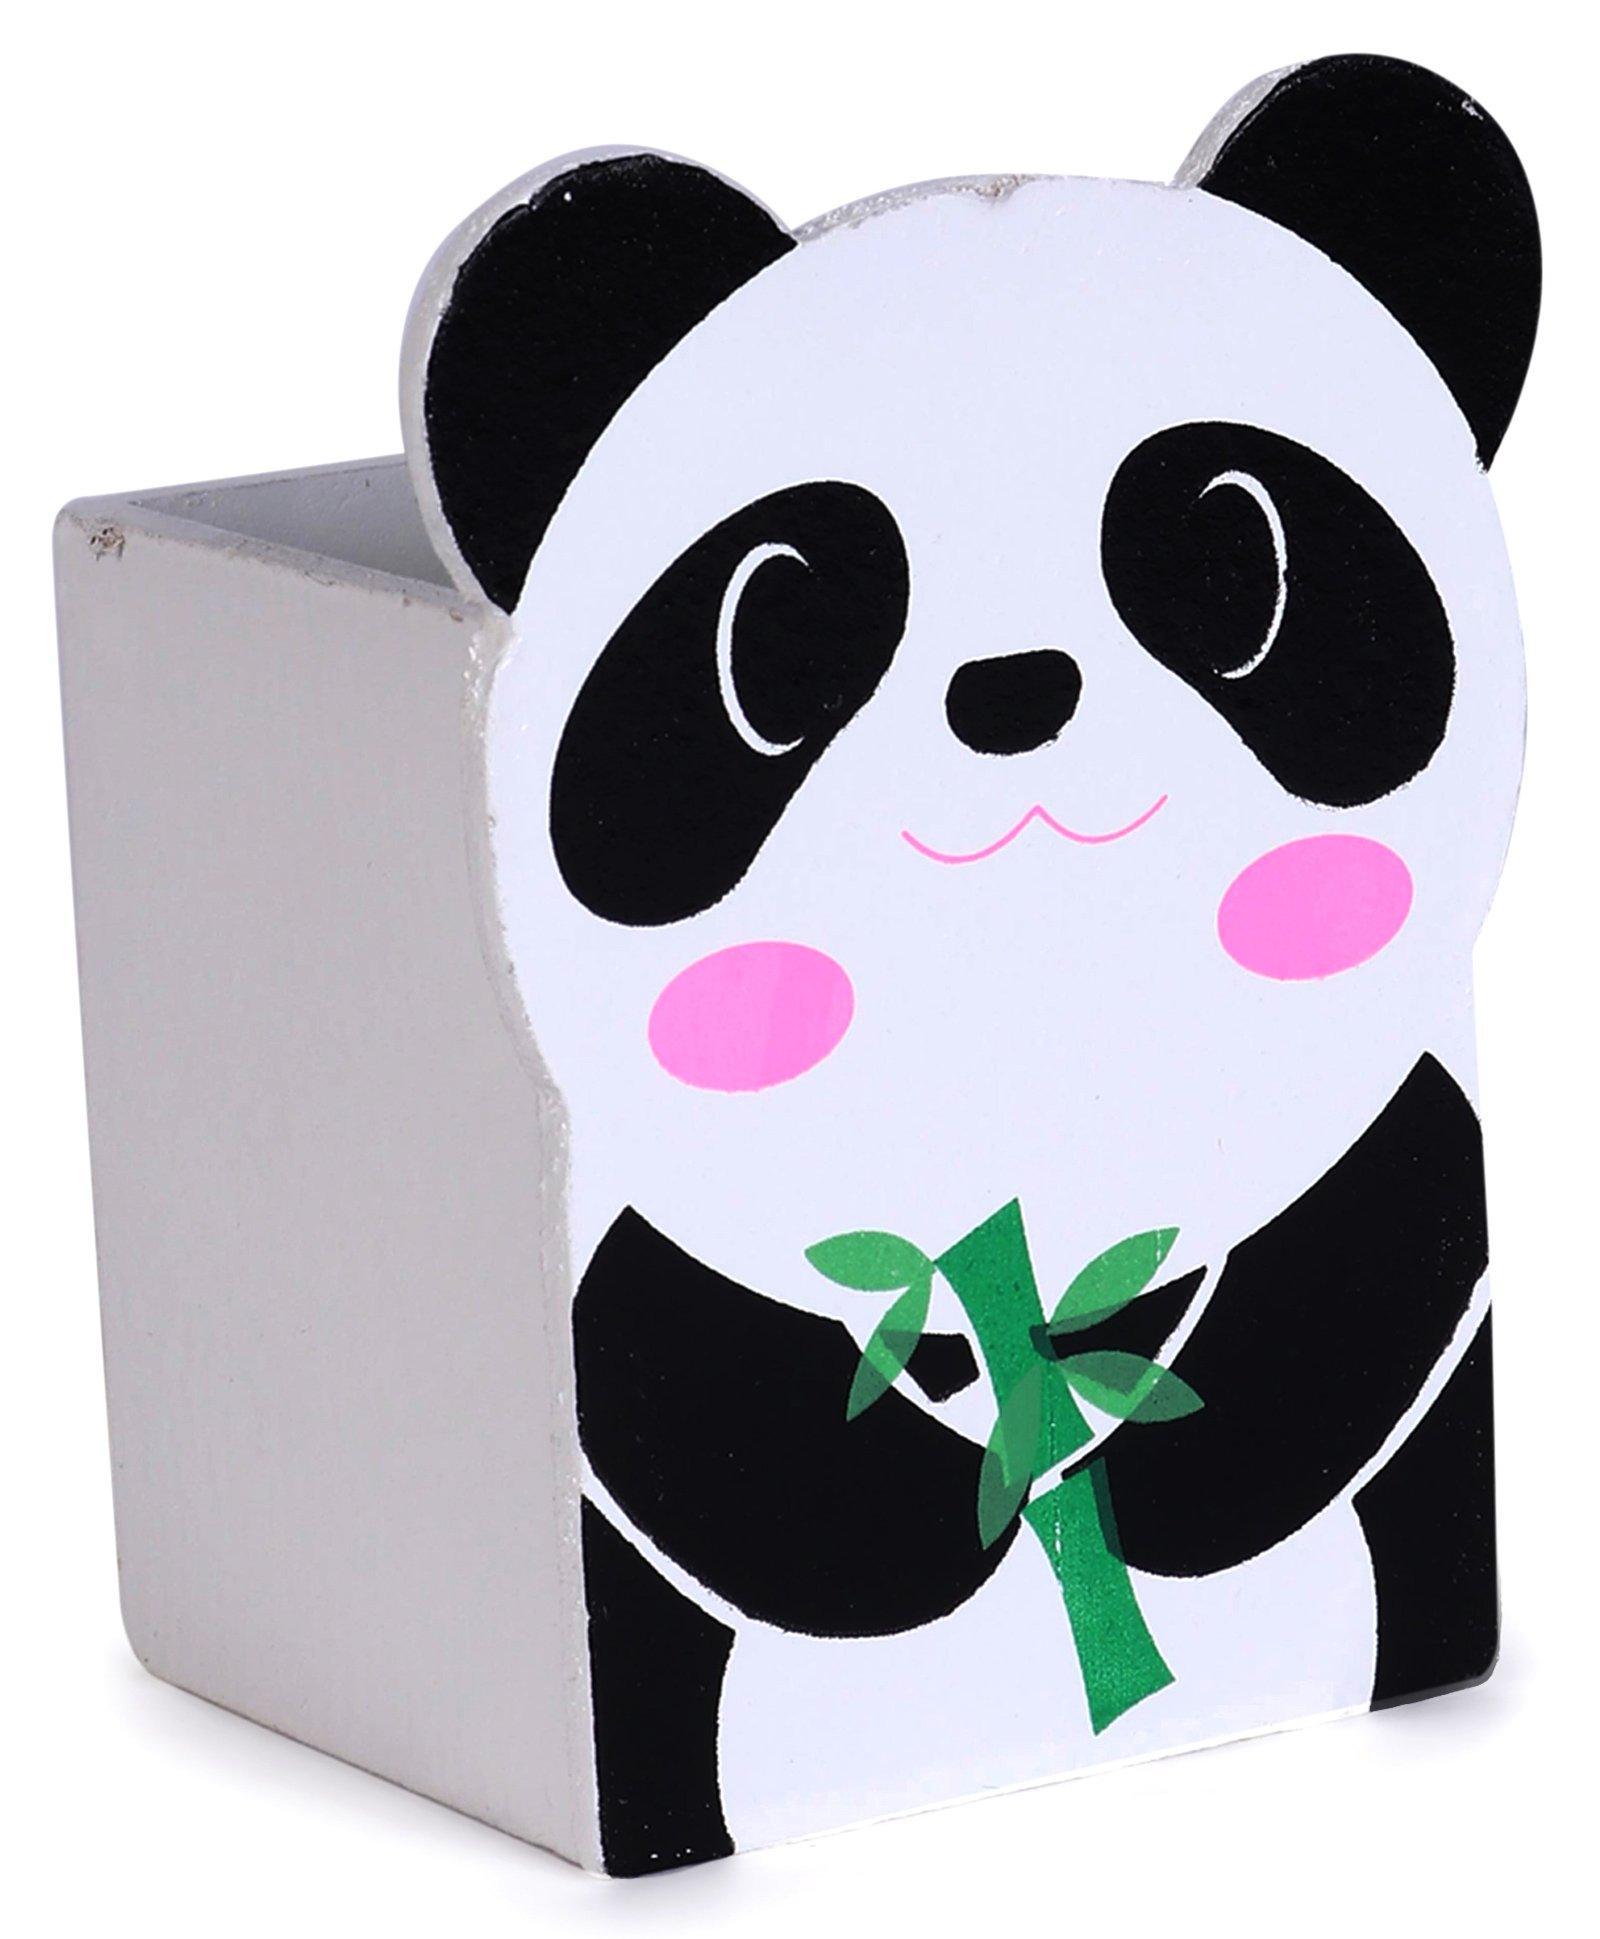 54fe6de2b380 Wooden Pencil Stand Panda Design Black & White Online in India ...